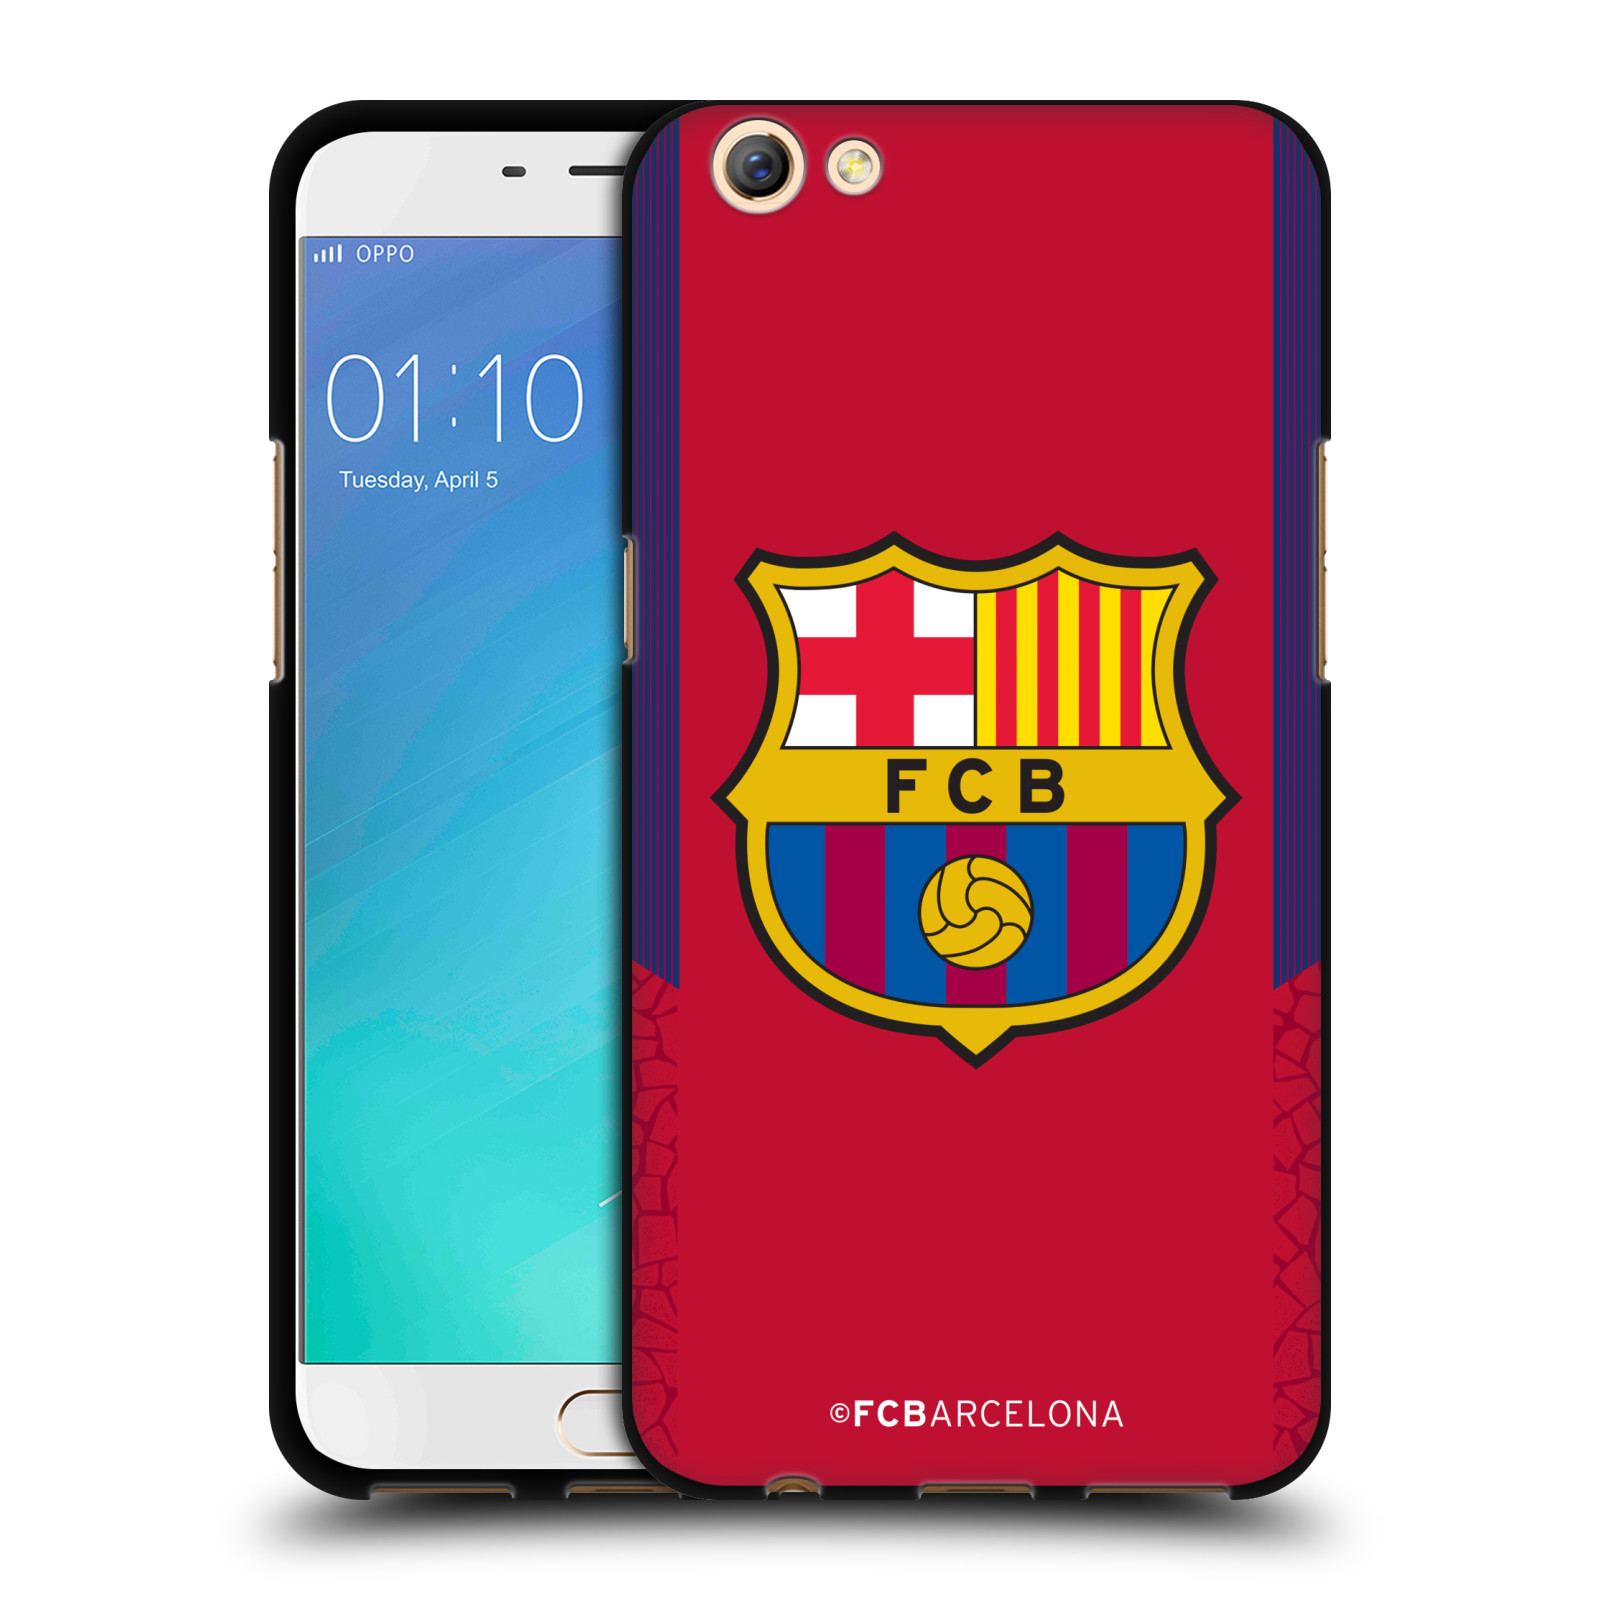 OFFICIAL-FC-BARCELONA-2017-18-CREST-KIT-BLACK-SOFT-GEL-CASE-FOR-OPPO-PHONES